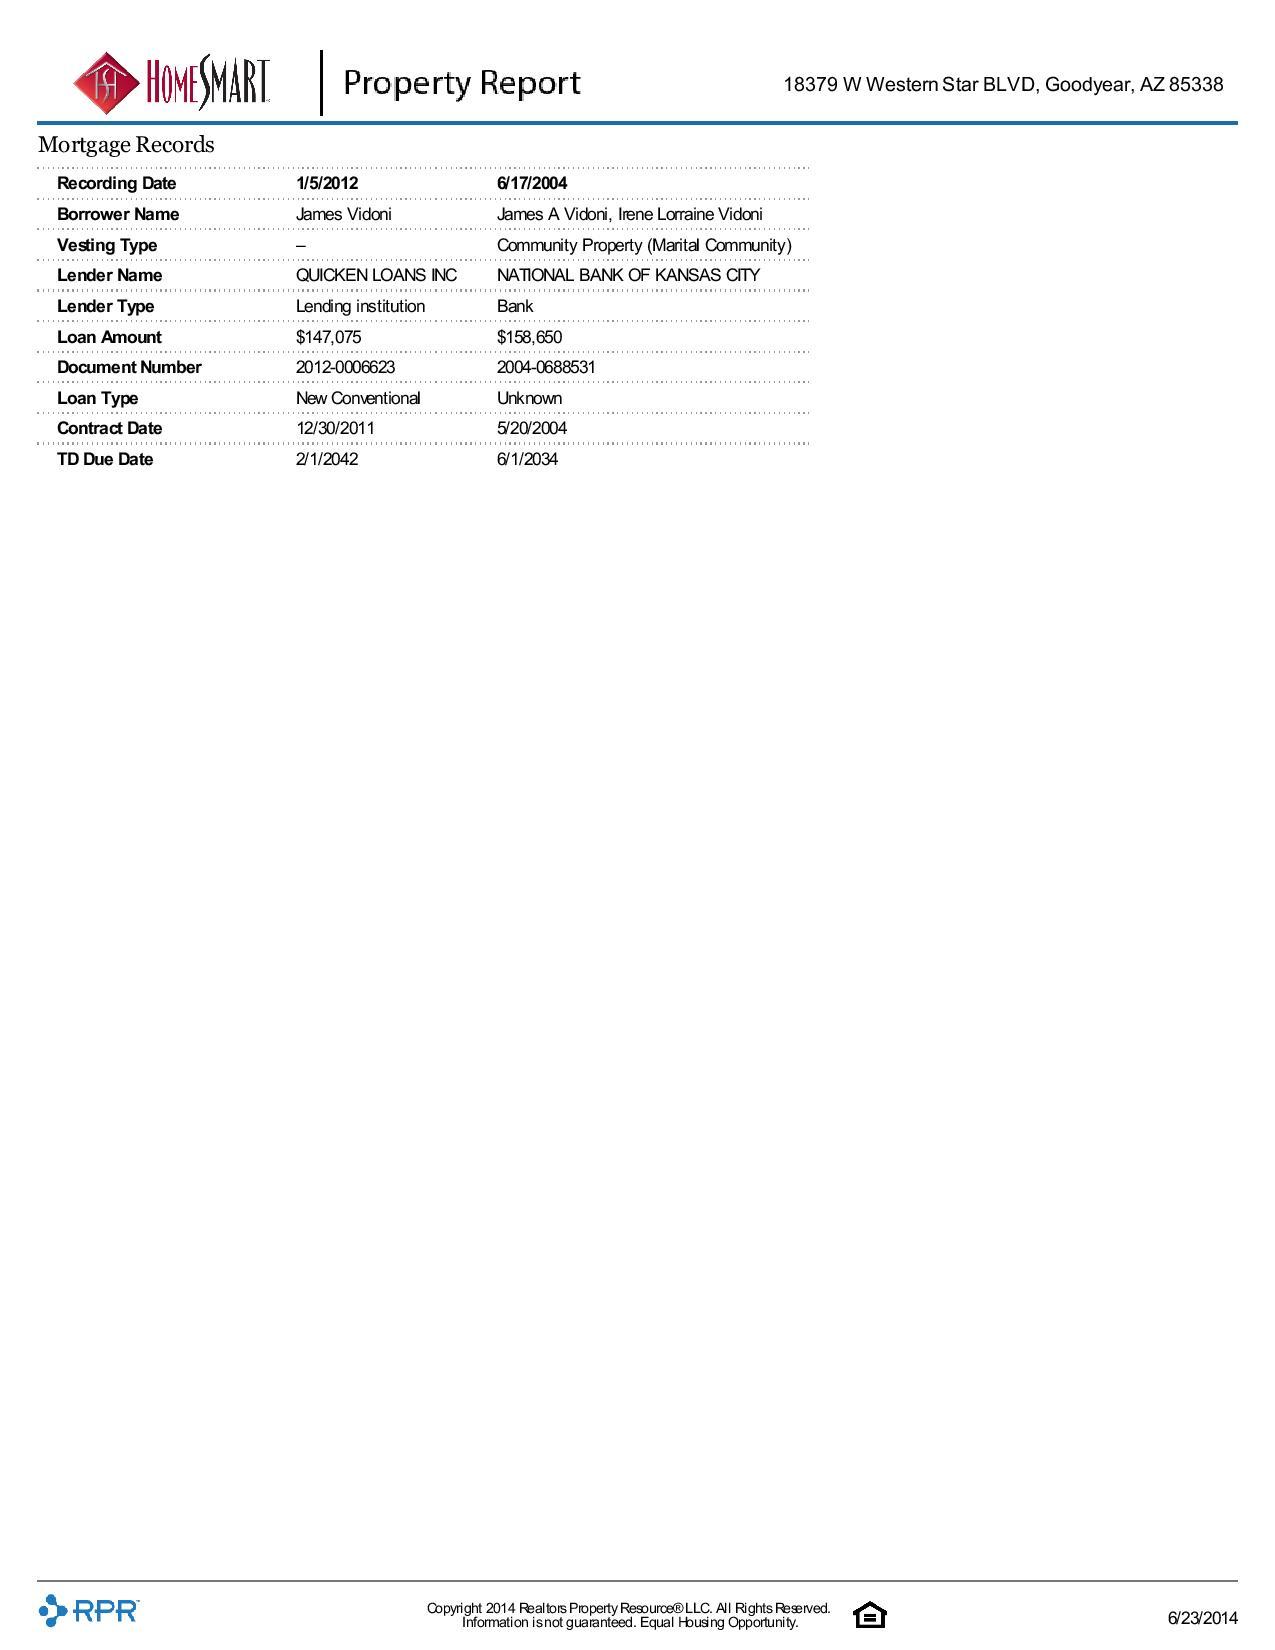 18379-W-Western-Star-BLVD-Goodyear-AZ-85338-page-008